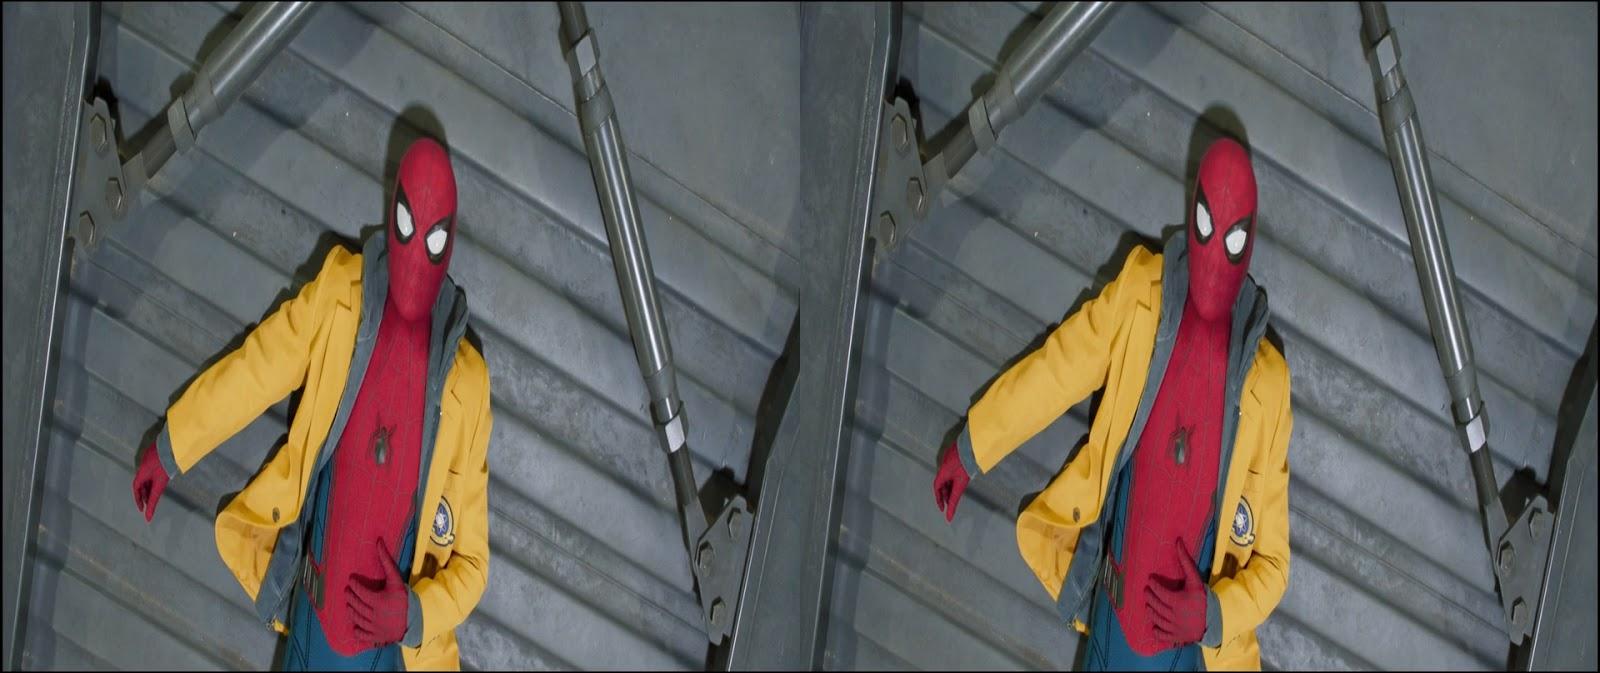 Spider-Man: De Regreso a Casa (2017) 1080p 3D SBS Latino – Ingles captura 3